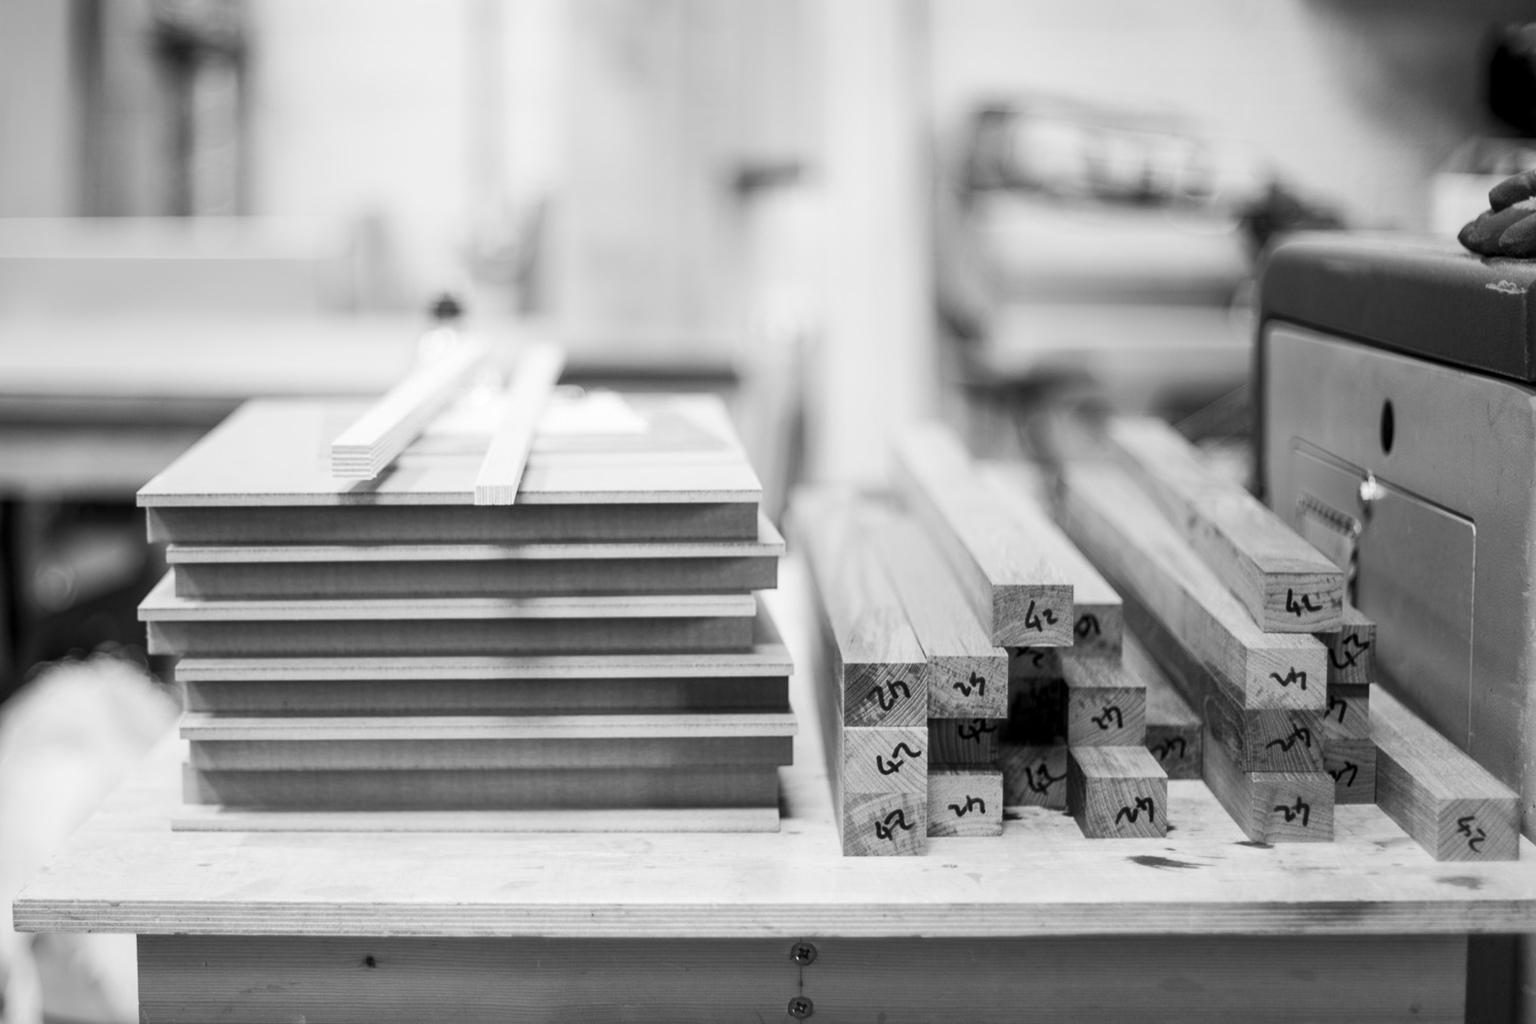 heartwood-cabinet-makers-somerset-englend-1